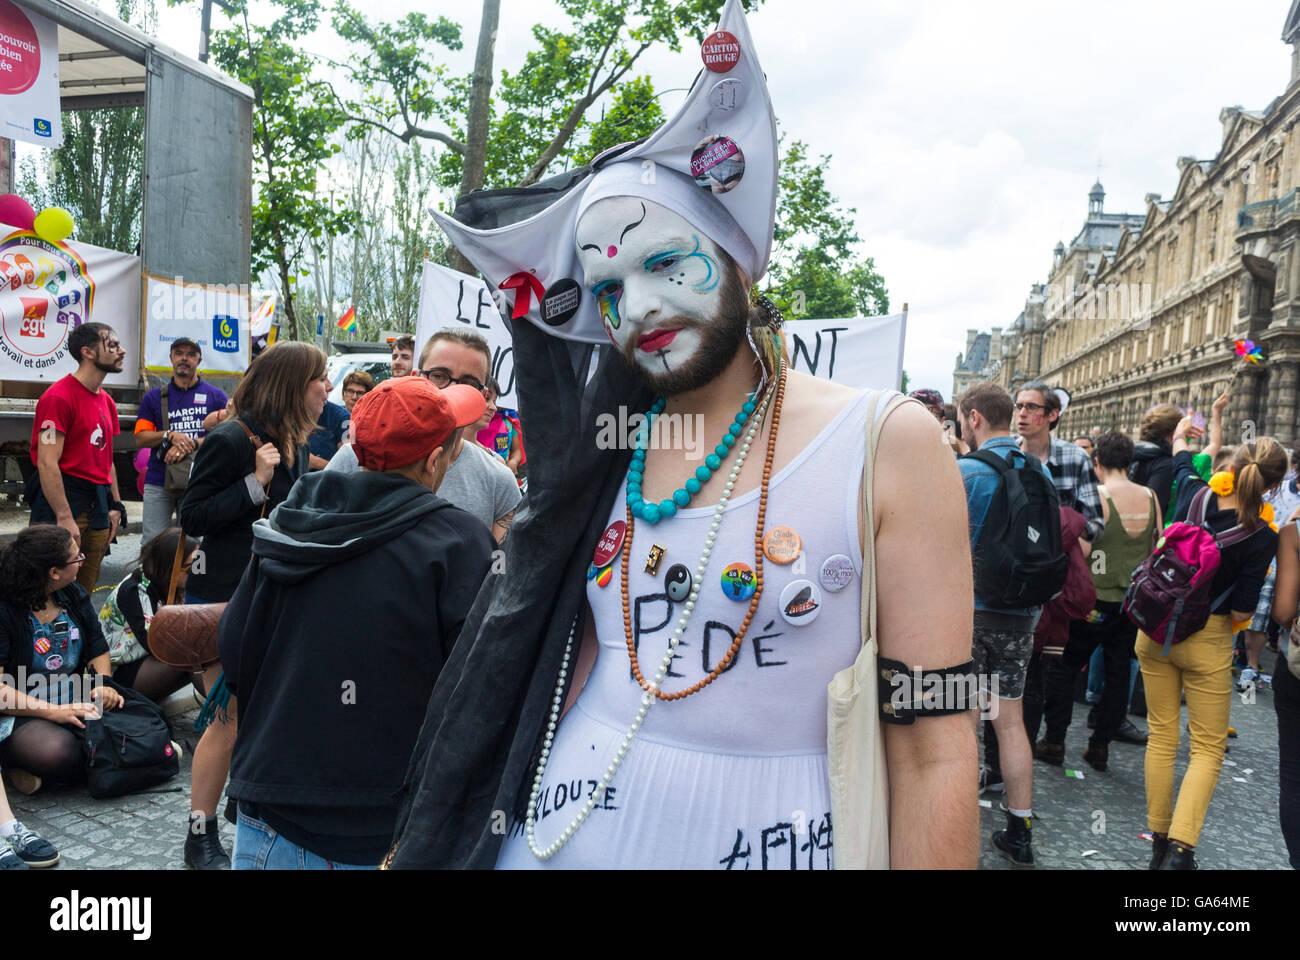 Gay Pride Halloween Costume.Paris France French Gay Pride Lgbt Activism Travestie Nun Man